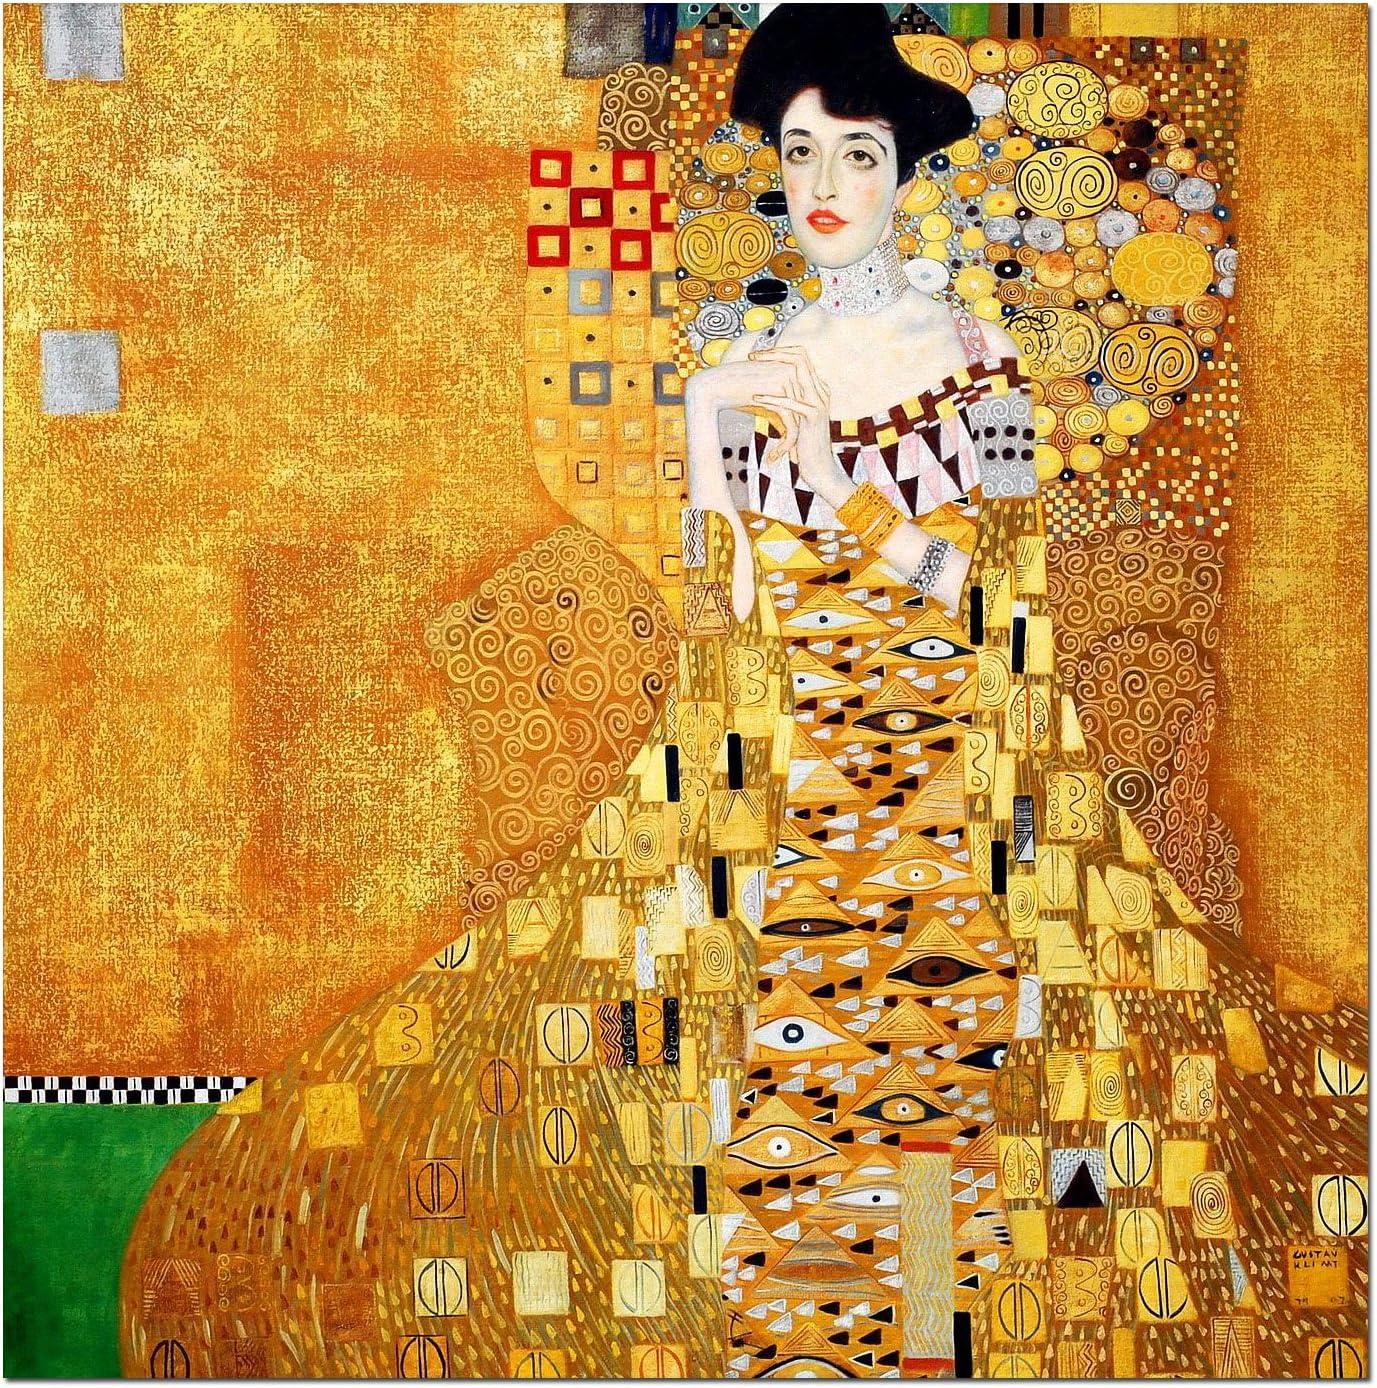 Gustav Klimt Adele Bloch Bauer 1 quadro stampa tela dipinto telaio arredo casa